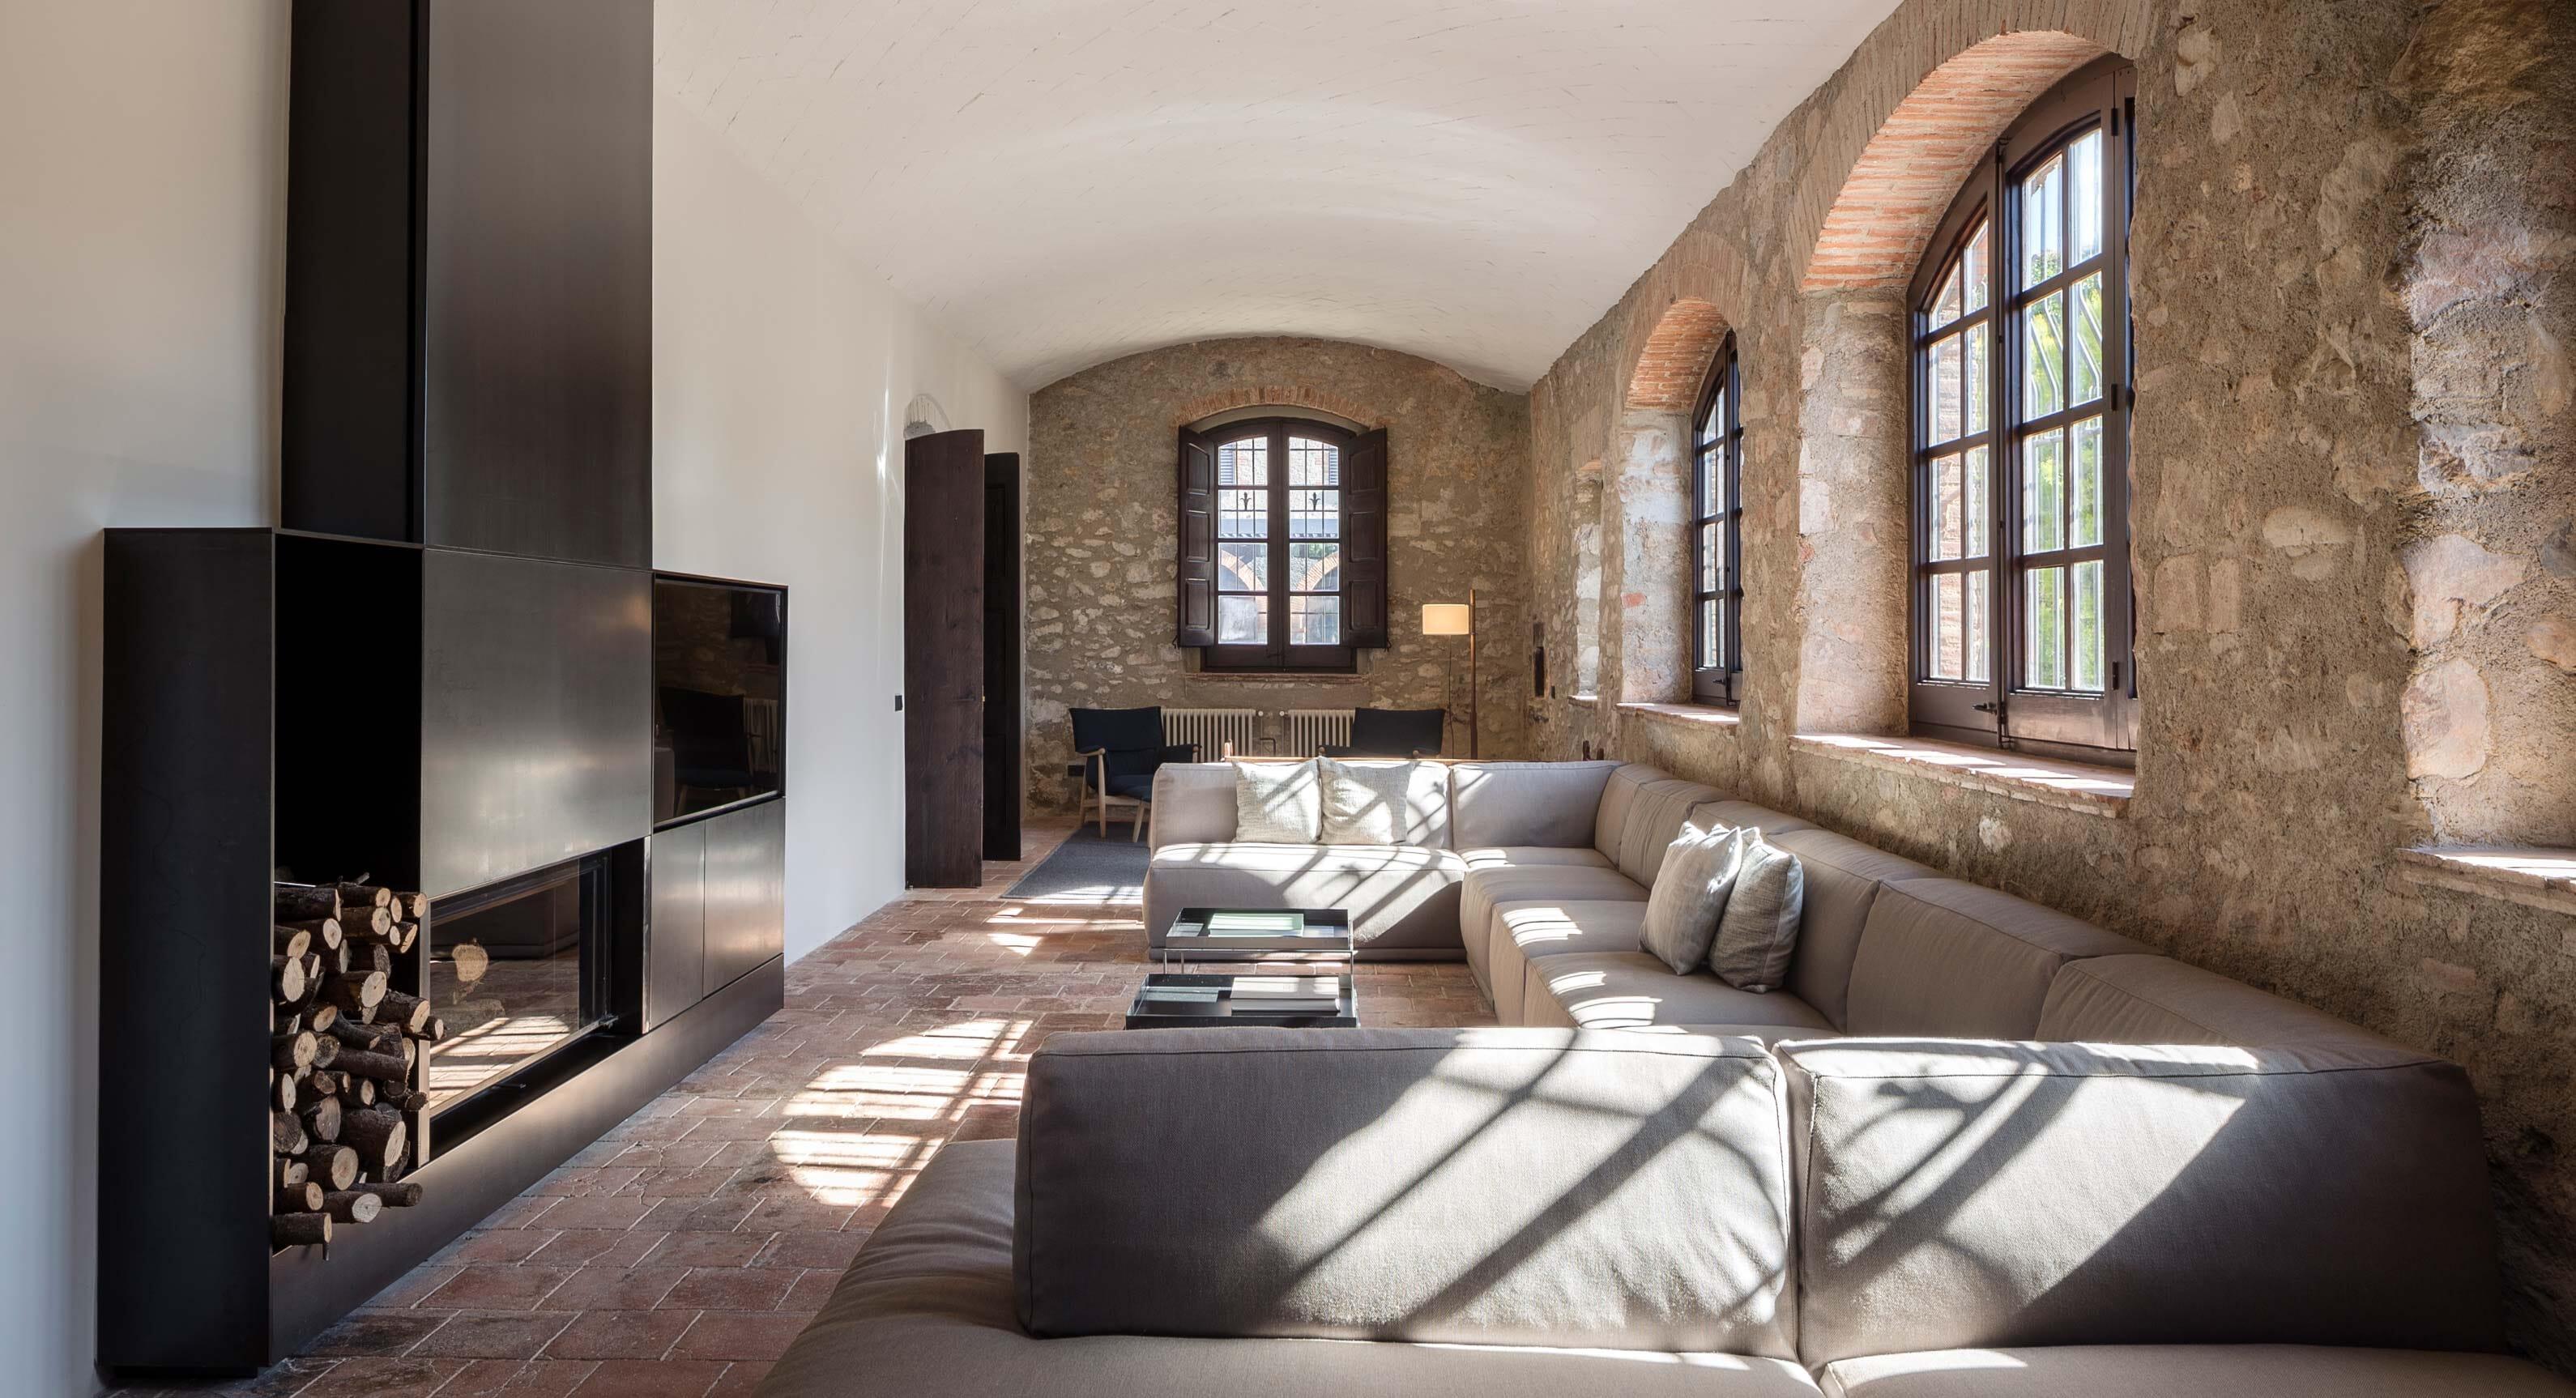 Sant Marti House: Francesc Rifé Studio's Hidden Valley Treasure